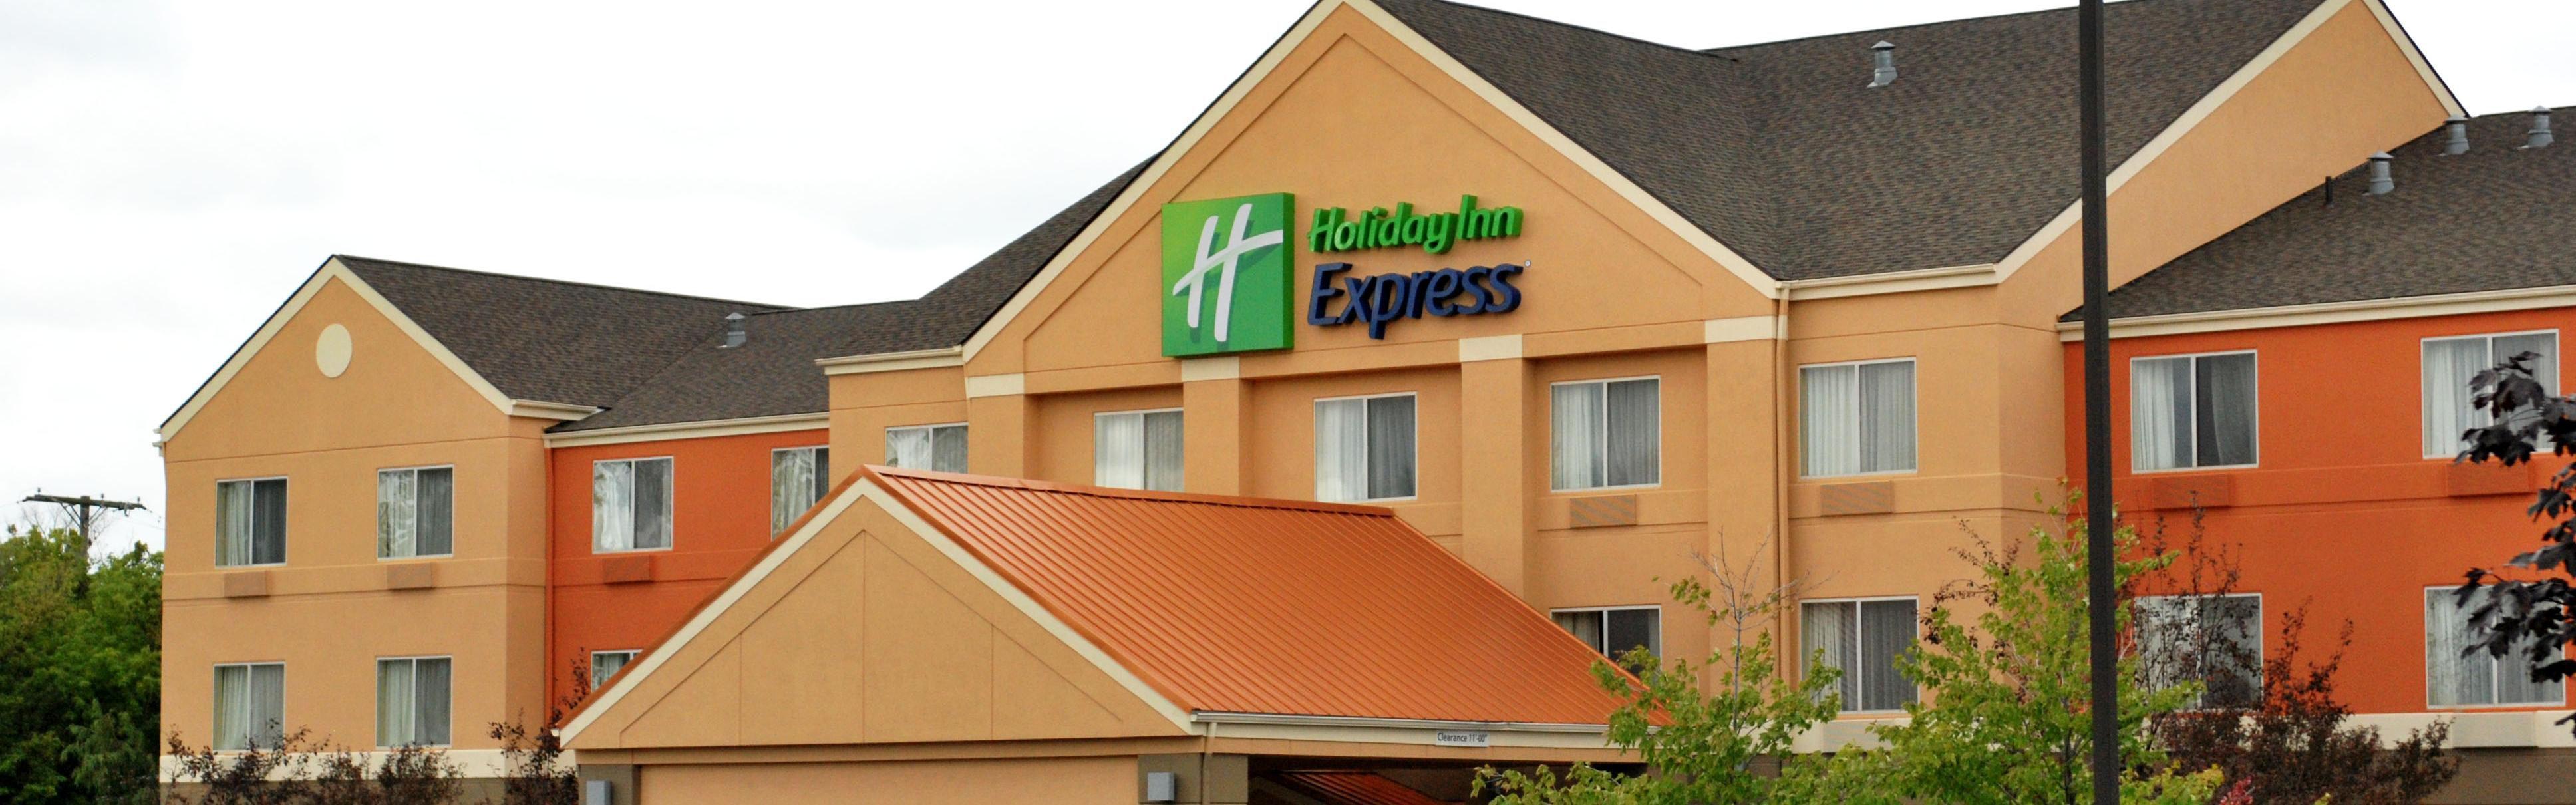 Holiday Inn Express Lapeer image 0